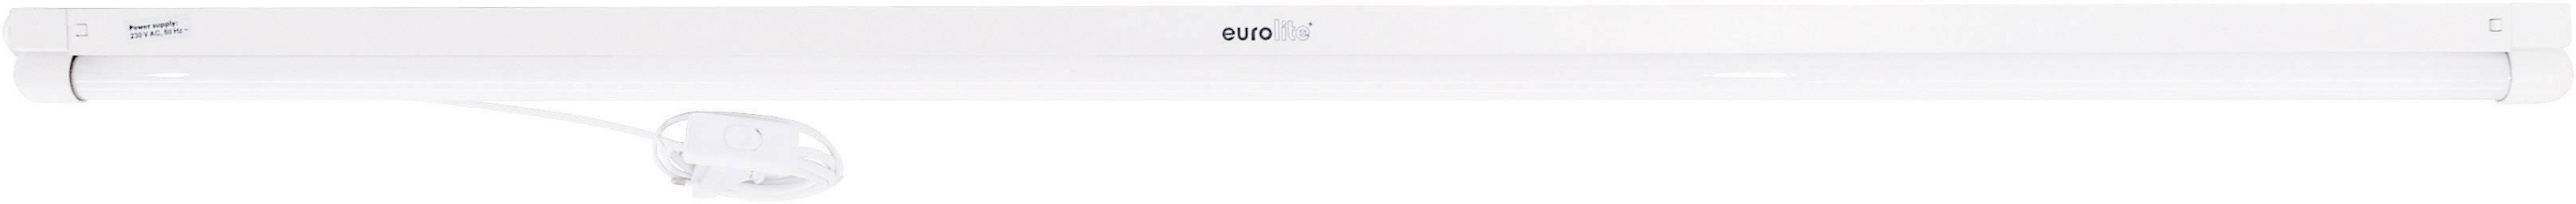 Žiarivka so zásuvkou Eurolite Neonröhren-Komplettset, 120 cm, 40 W, biela, 1 ks